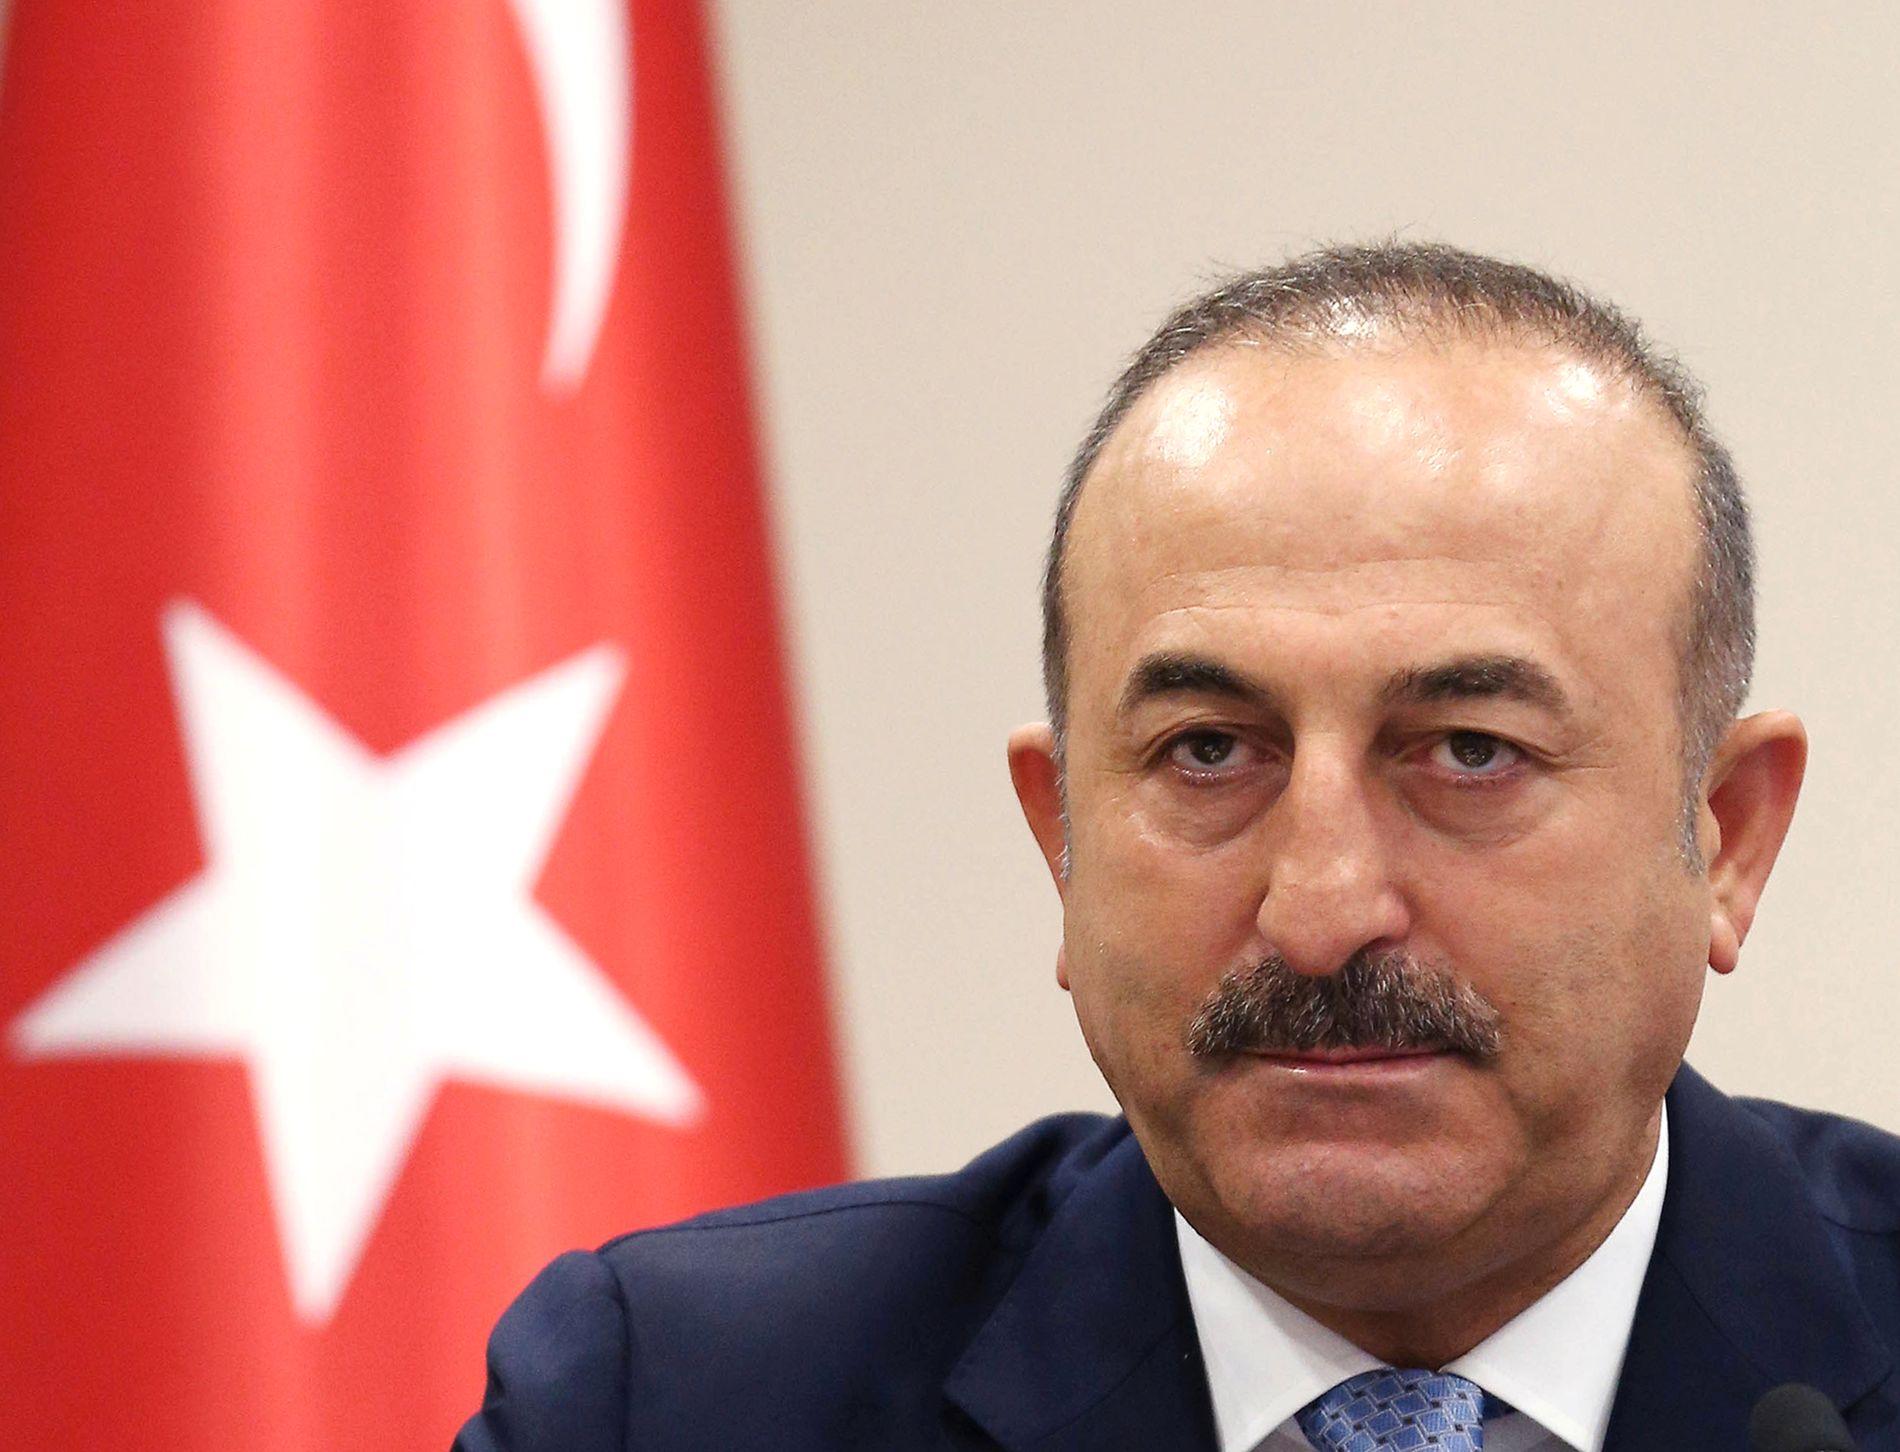 IKKE FORNØYD: Tyrkias utenriksminister Mevlüt Çavusoglu.